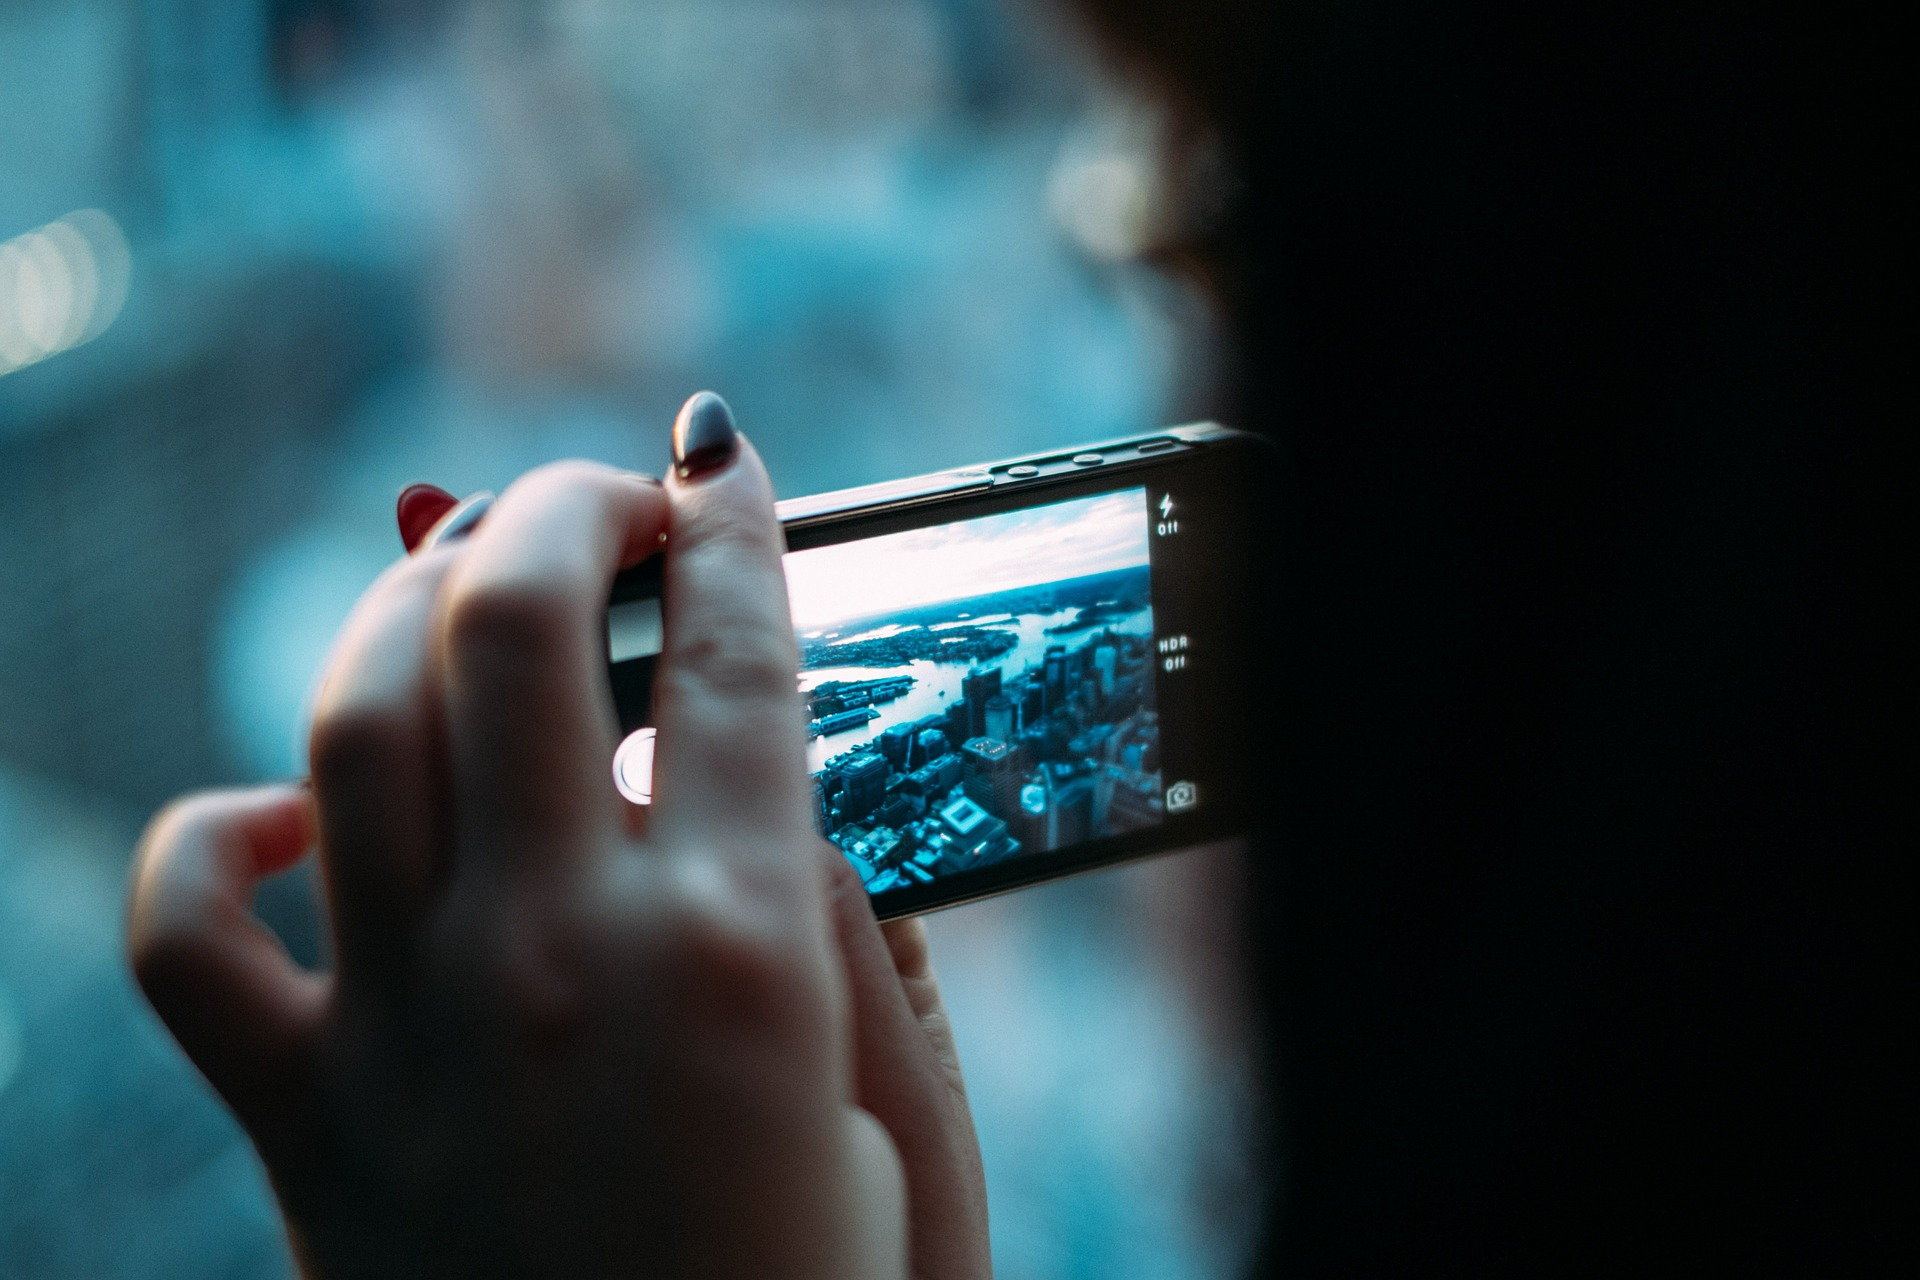 smartphone-g0b9ae4bce_1920